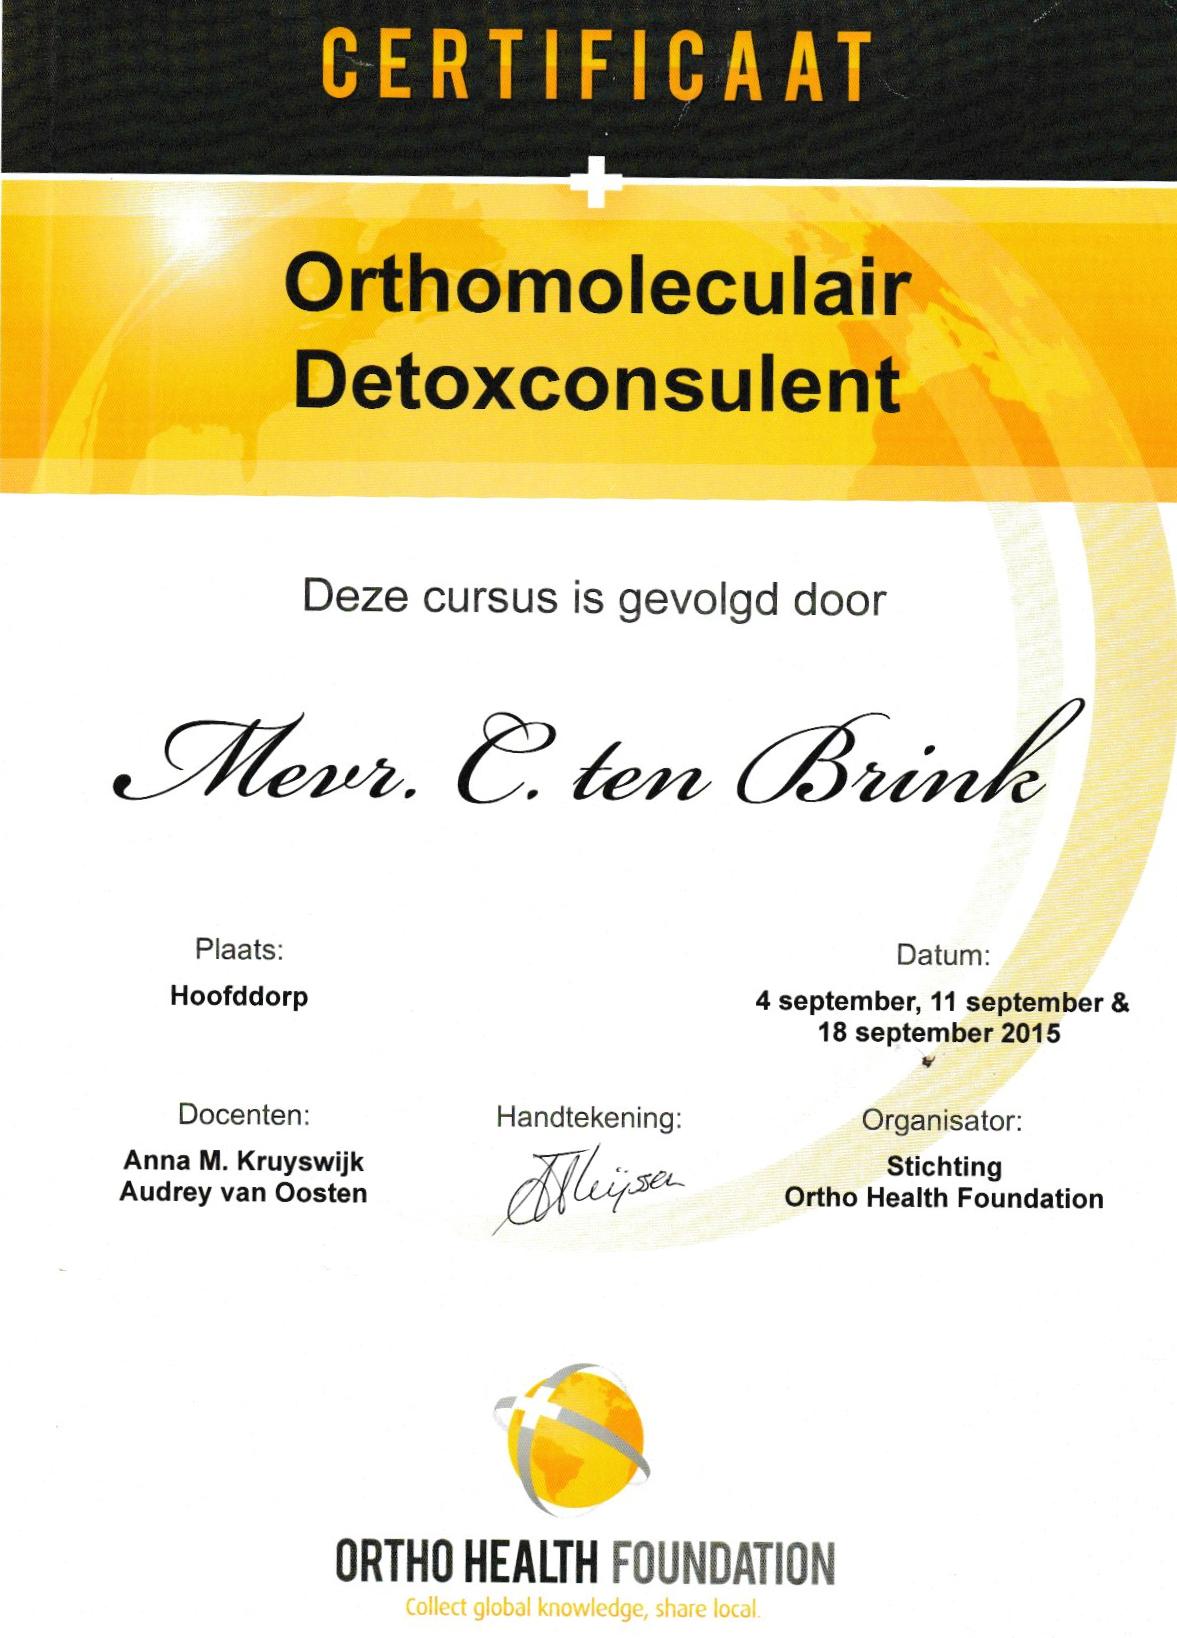 Deetox consulente diploma